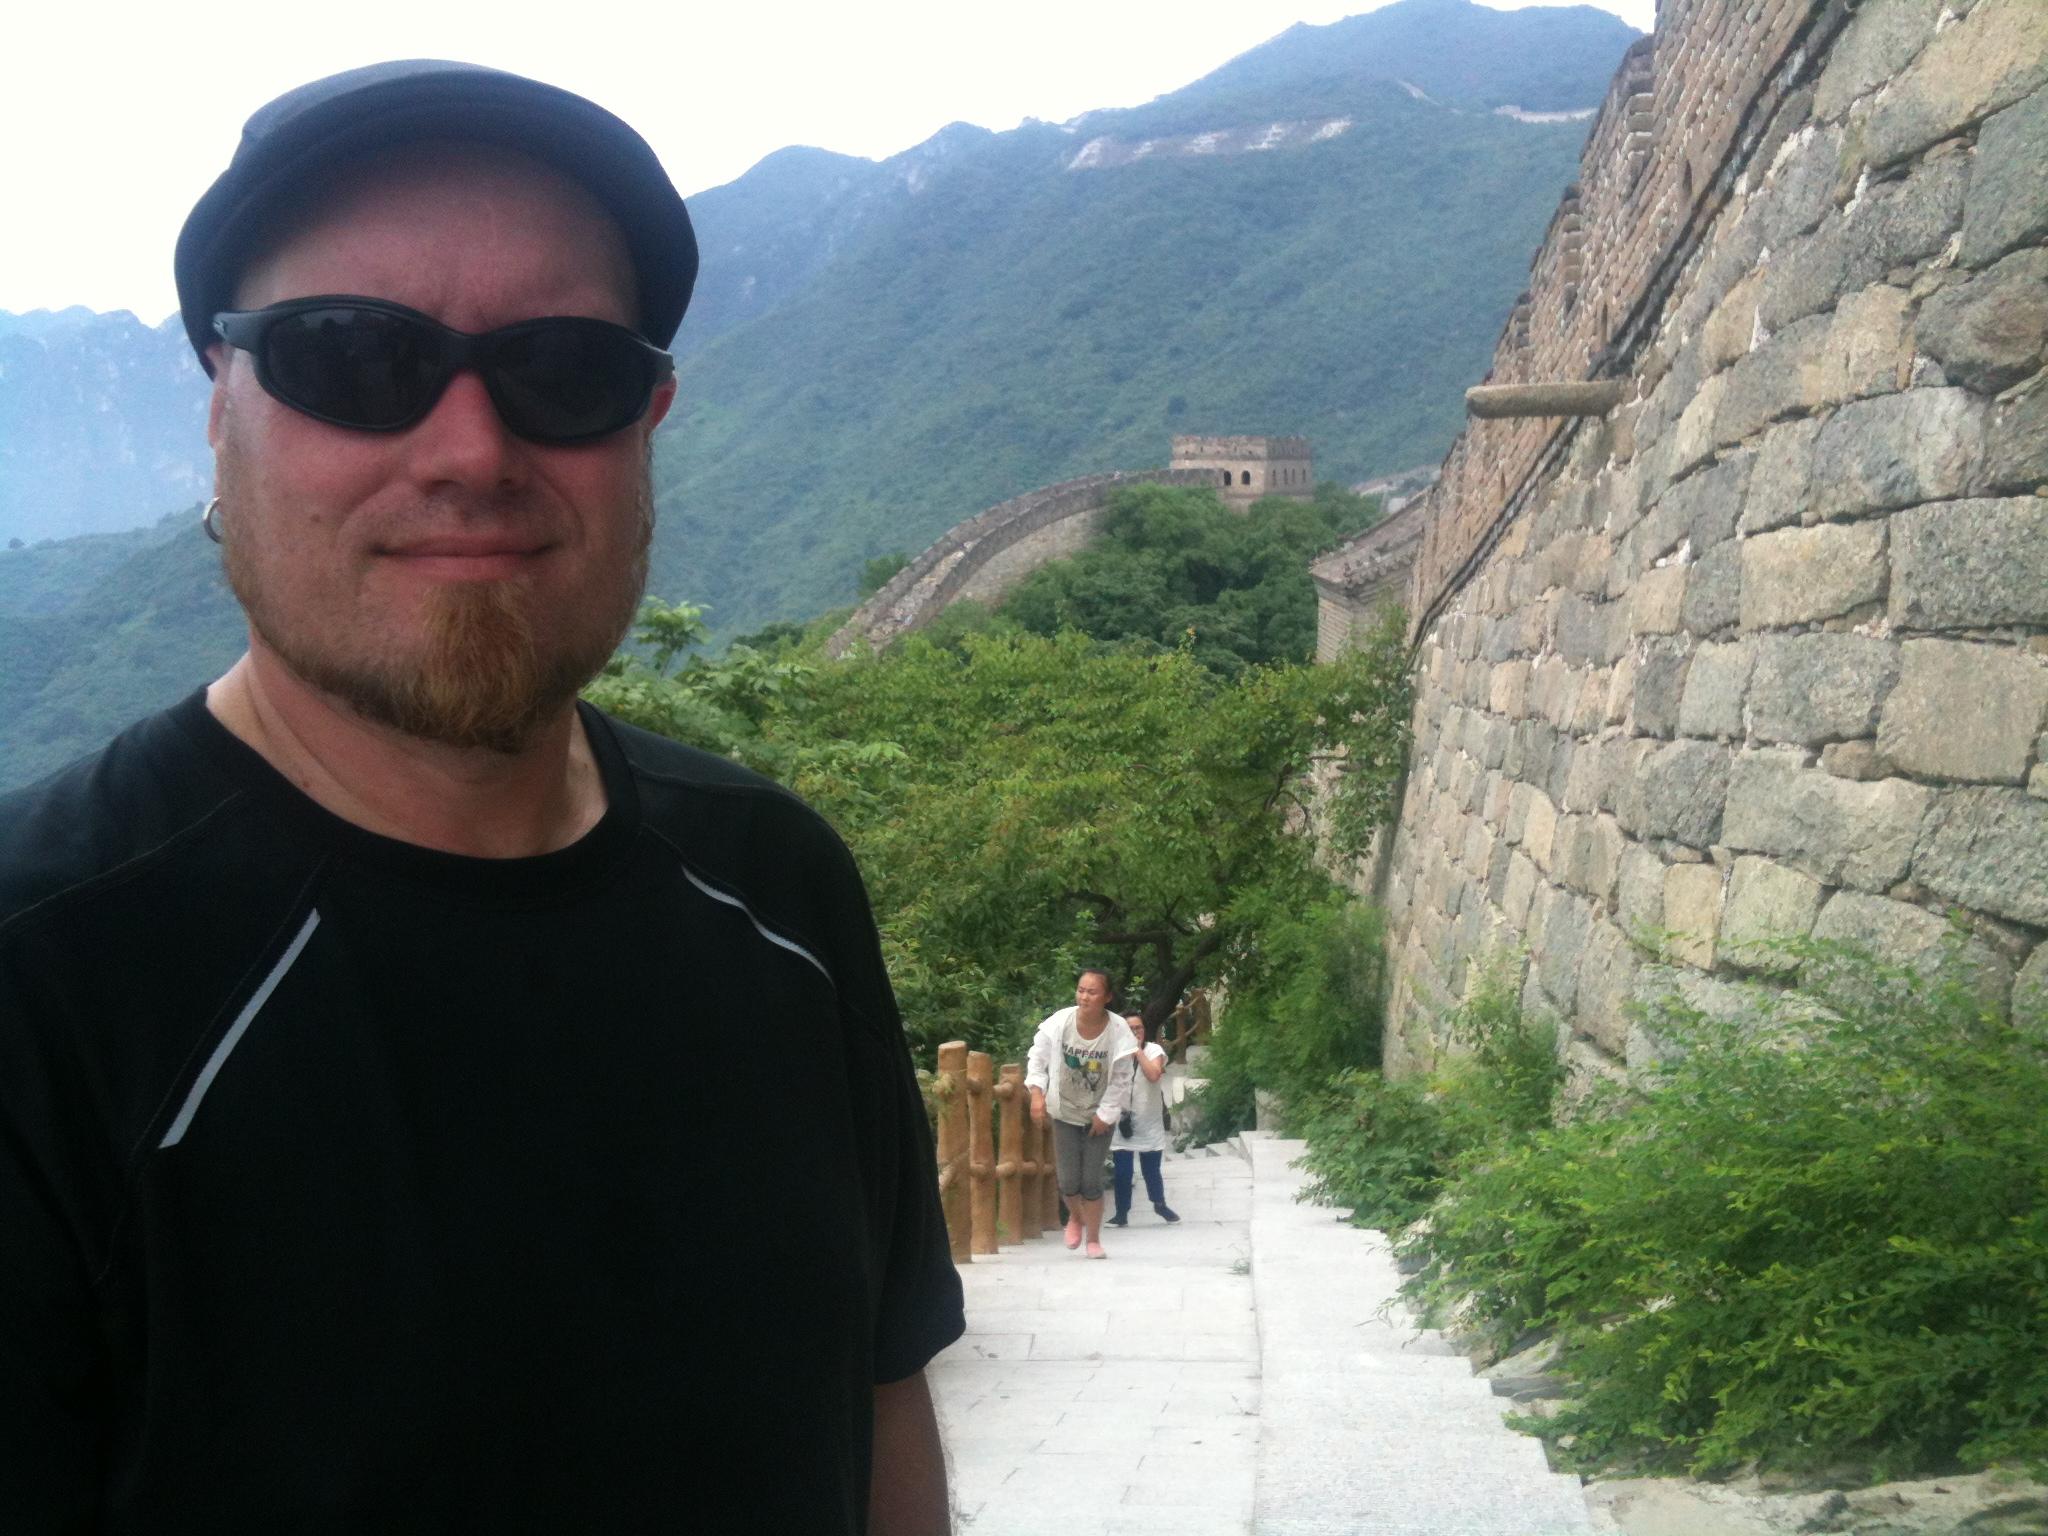 Michael Love at the Great Wall of China